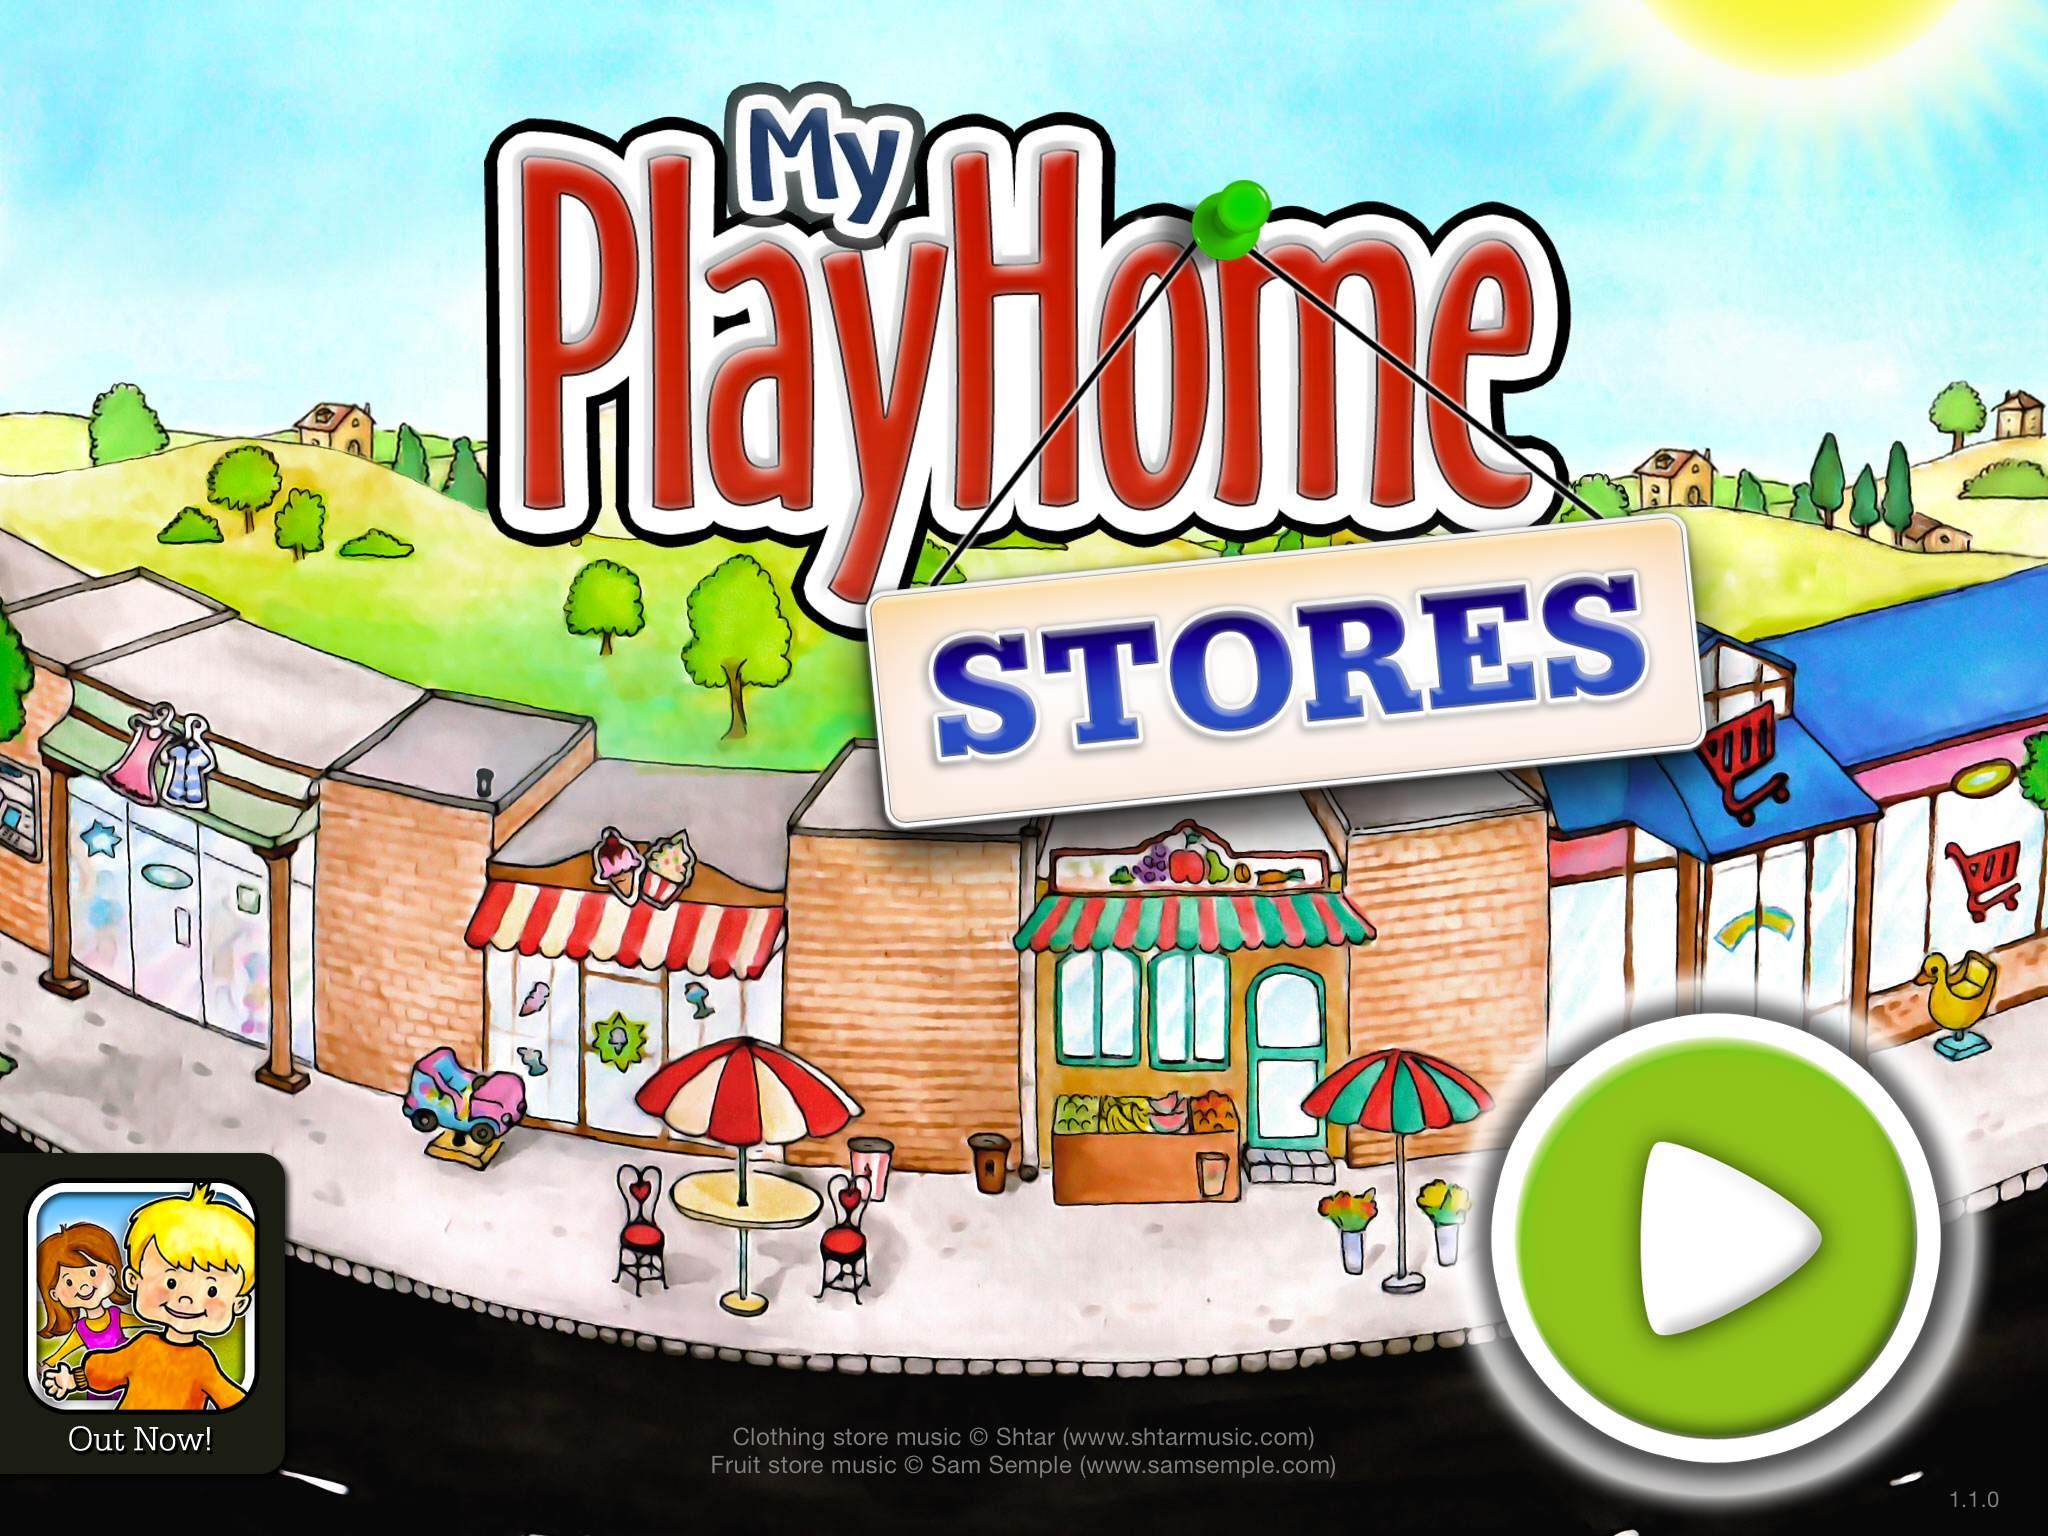 تحميل لعبة my play home stores مجانا